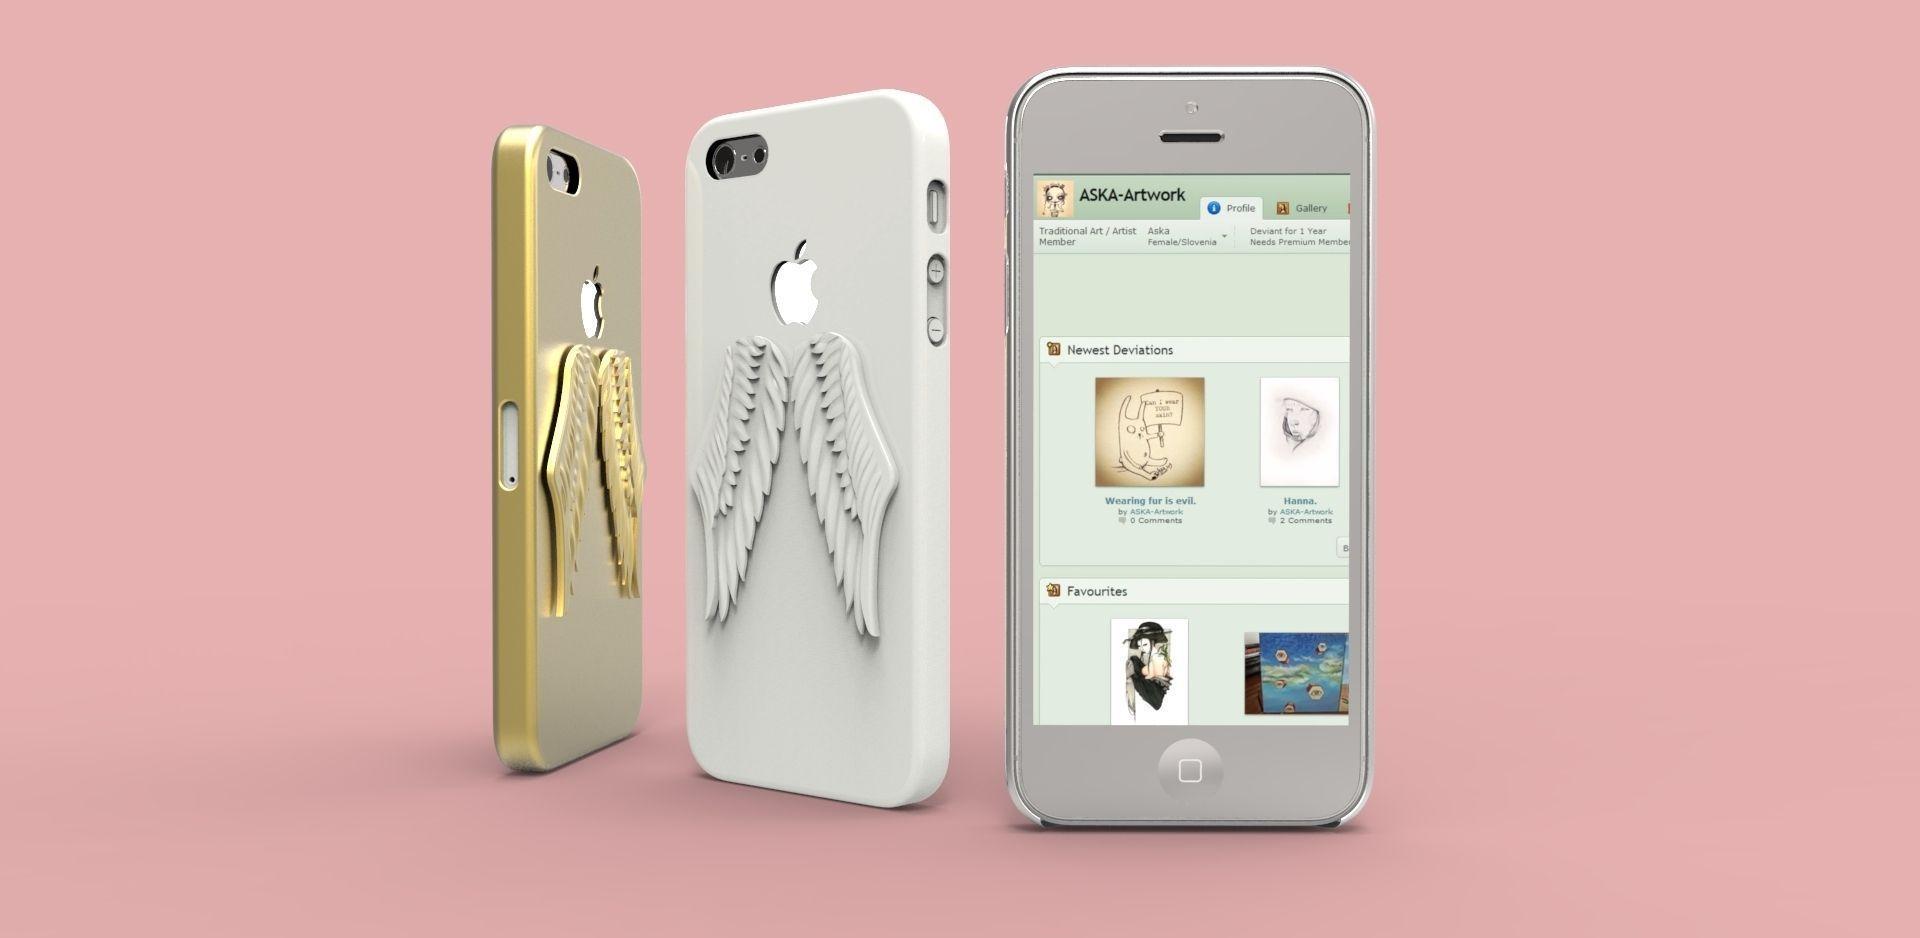 iPhone 5 Angel Wings case